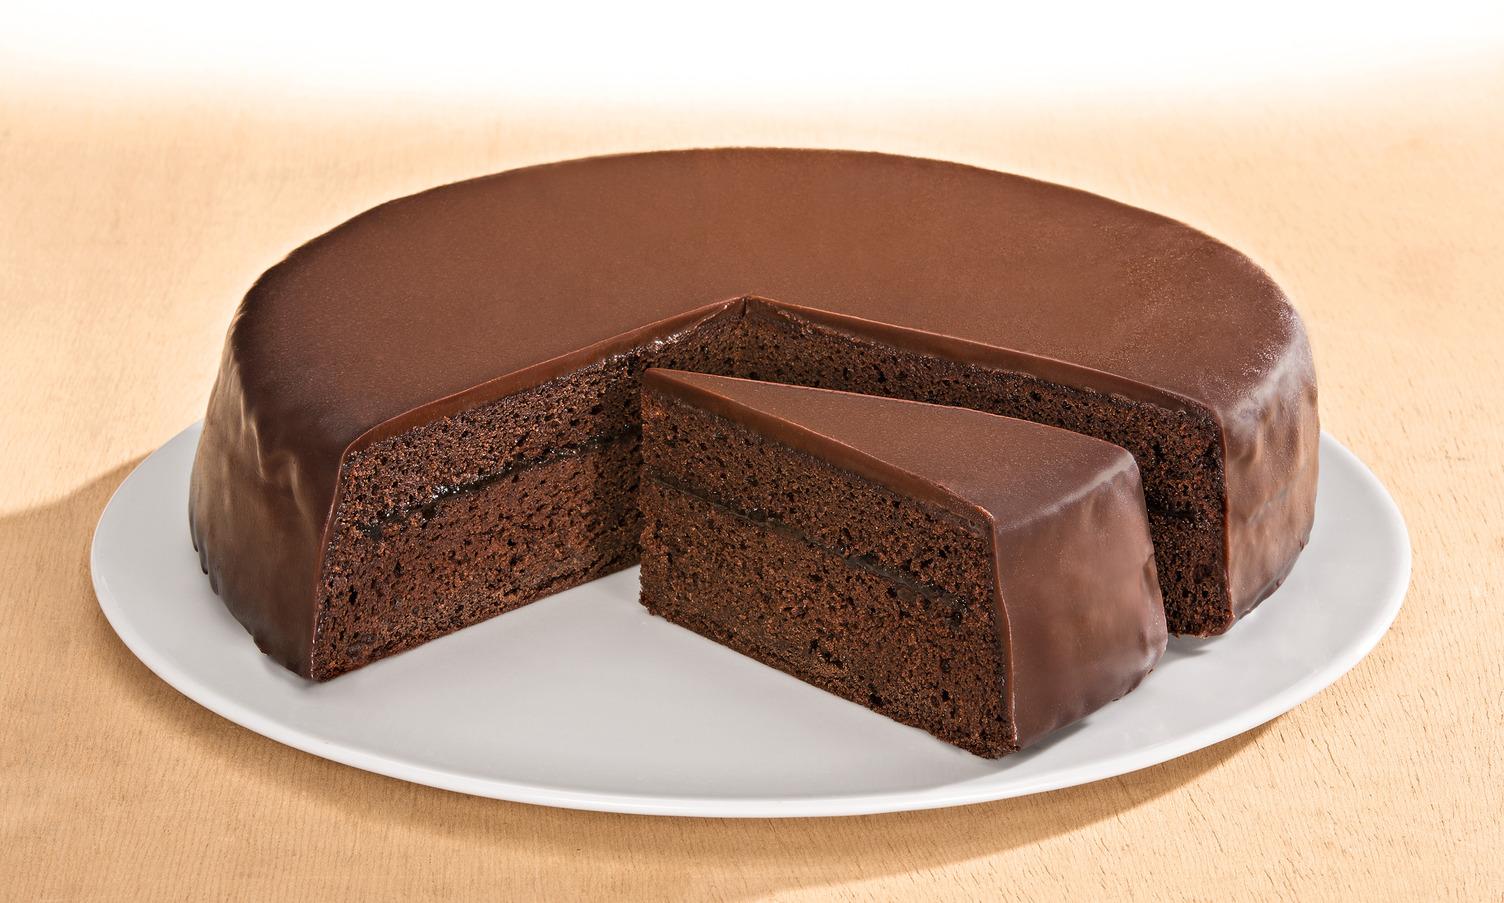 NESTLE SCHOELLER Sacher Torte 1500 g